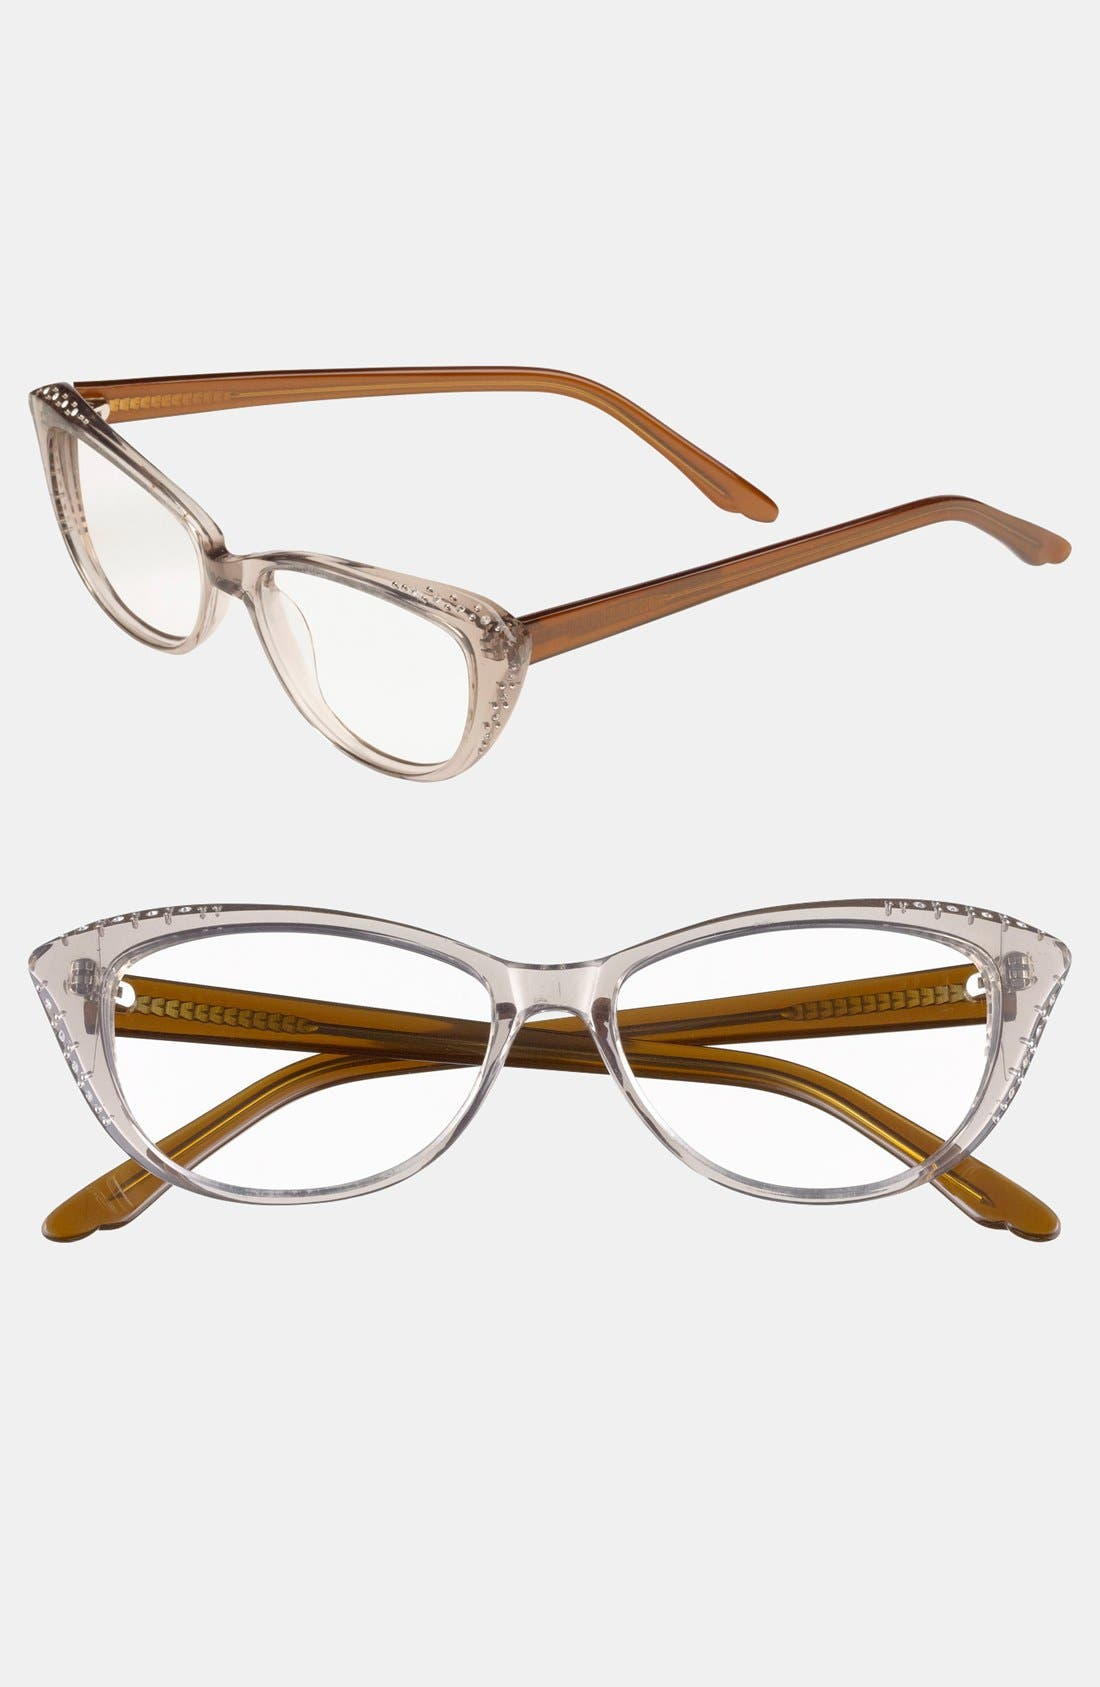 Alternate Image 1 Selected - Corinne McCormack 'Belle' 51mm Reading Glasses